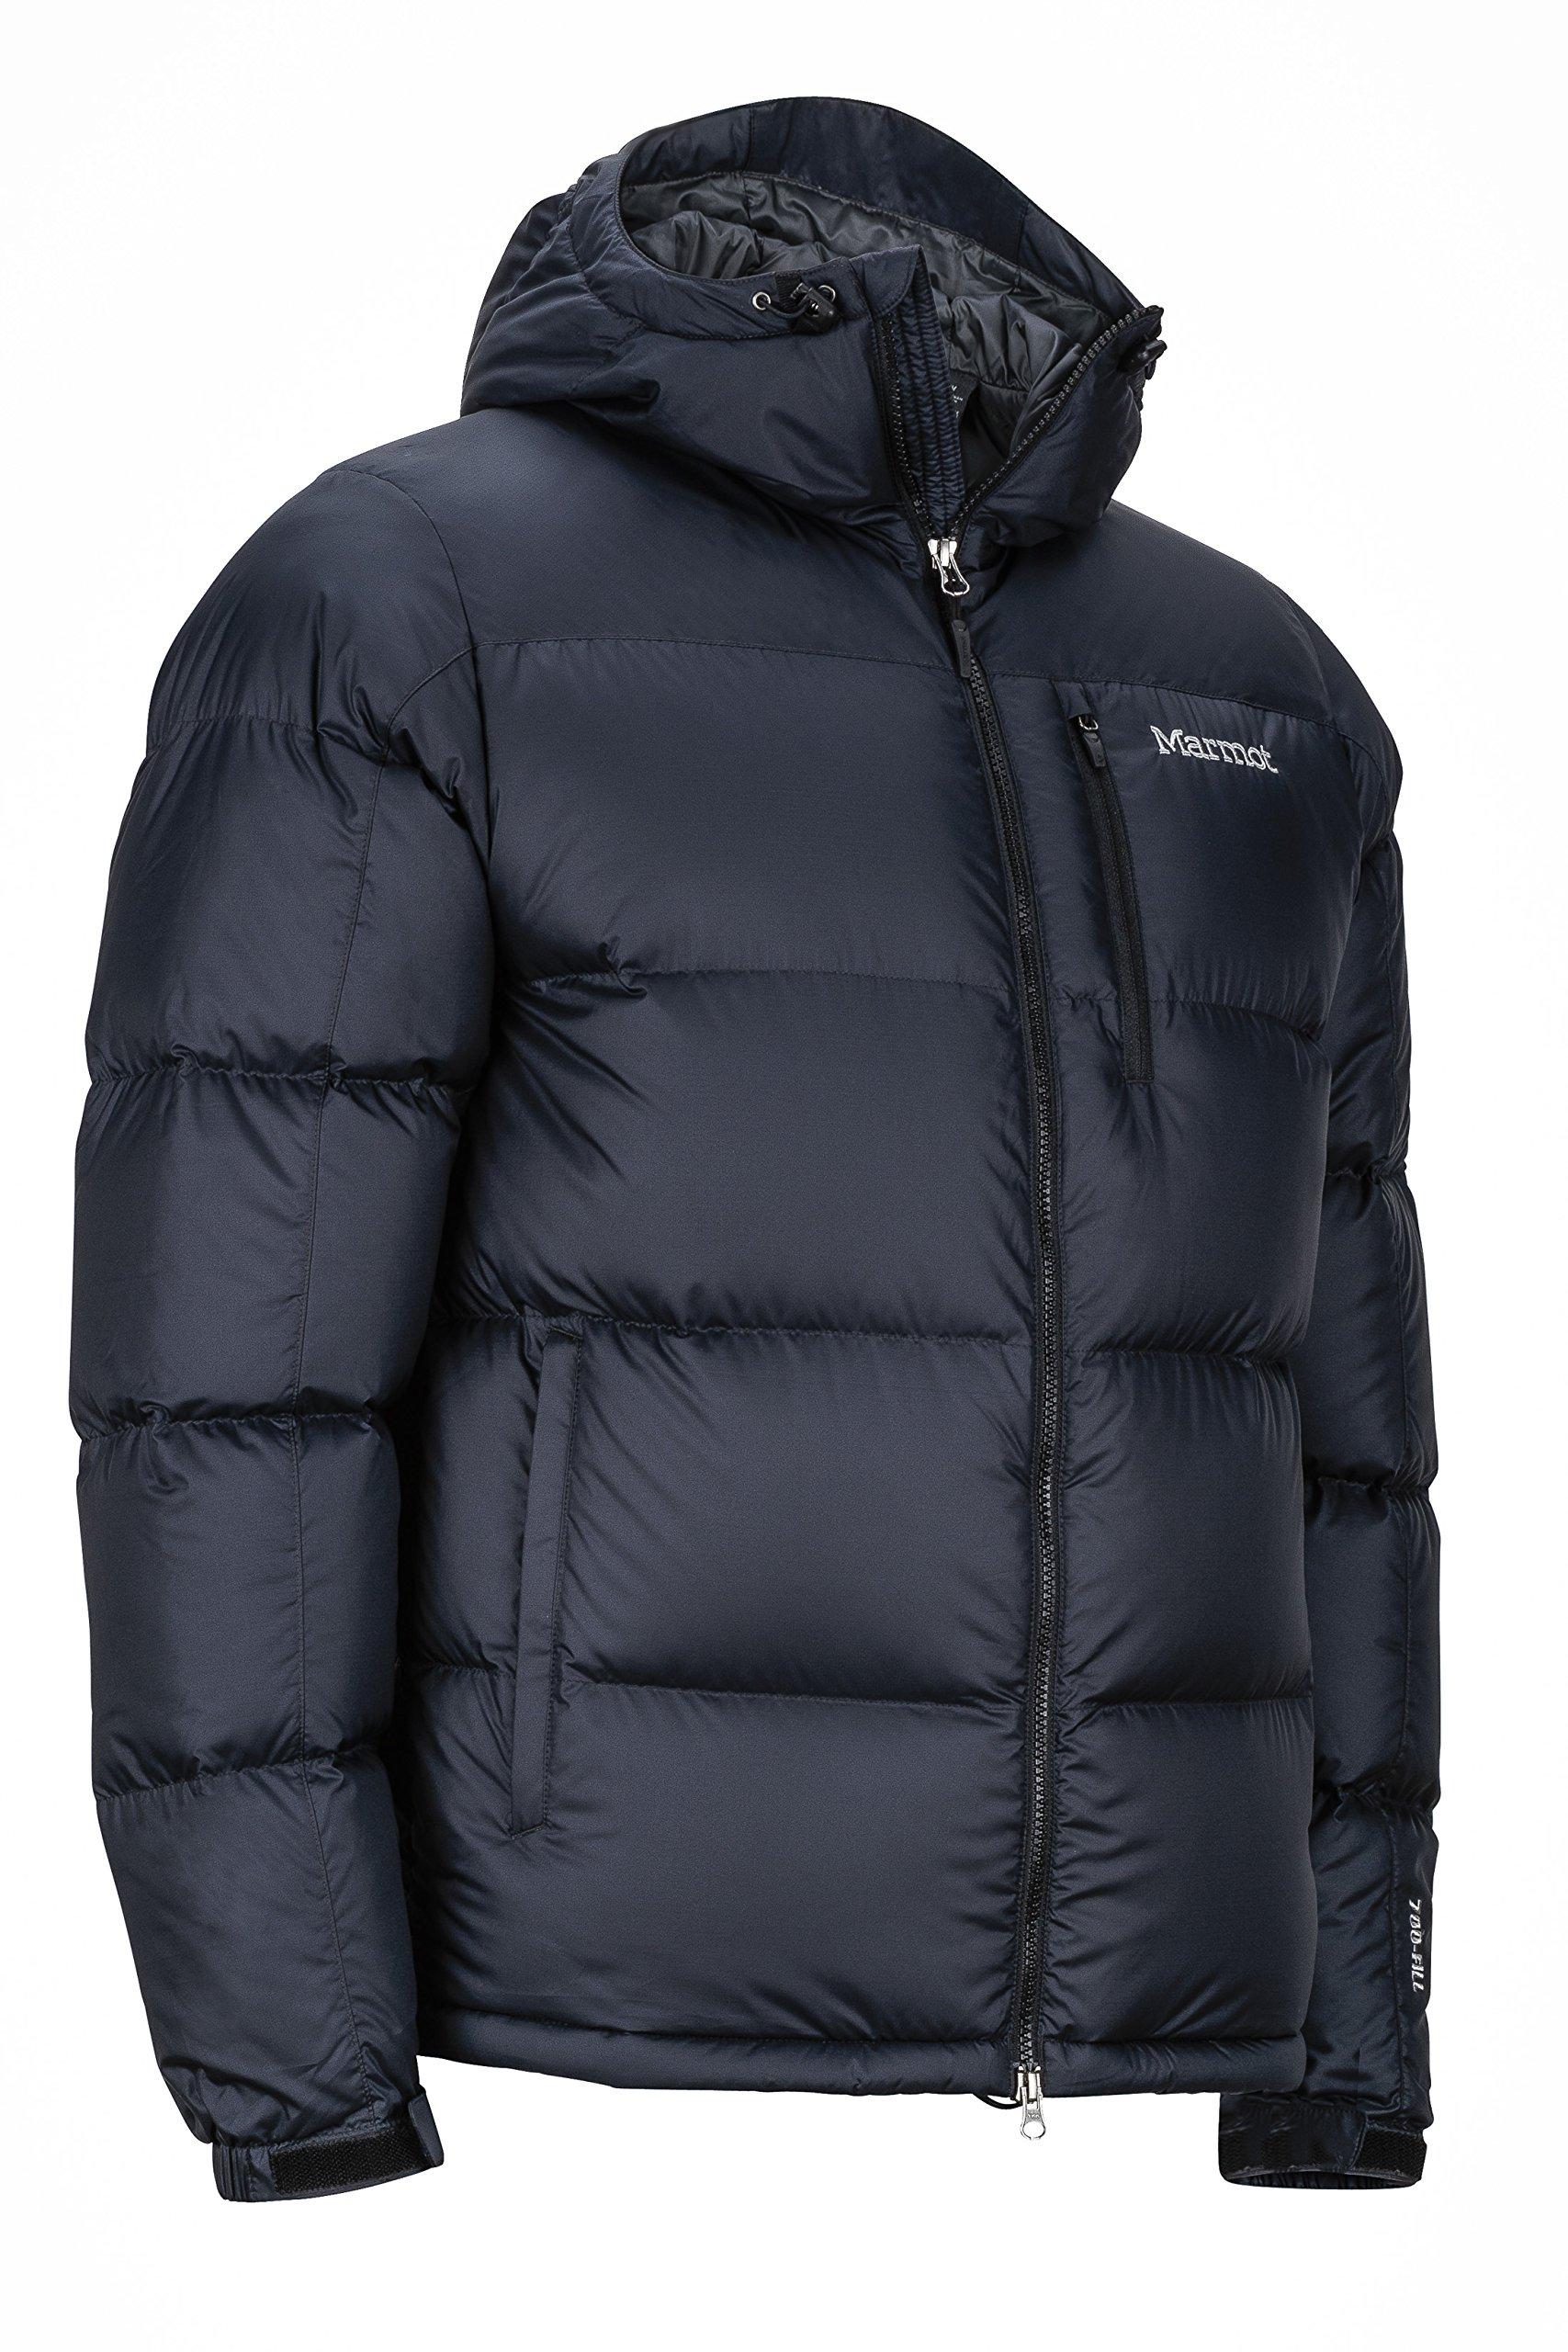 91crxItYZPL - Marmot Guides Down Winter Puffer Jacket with Hood, Men, 700 Fill Power Down